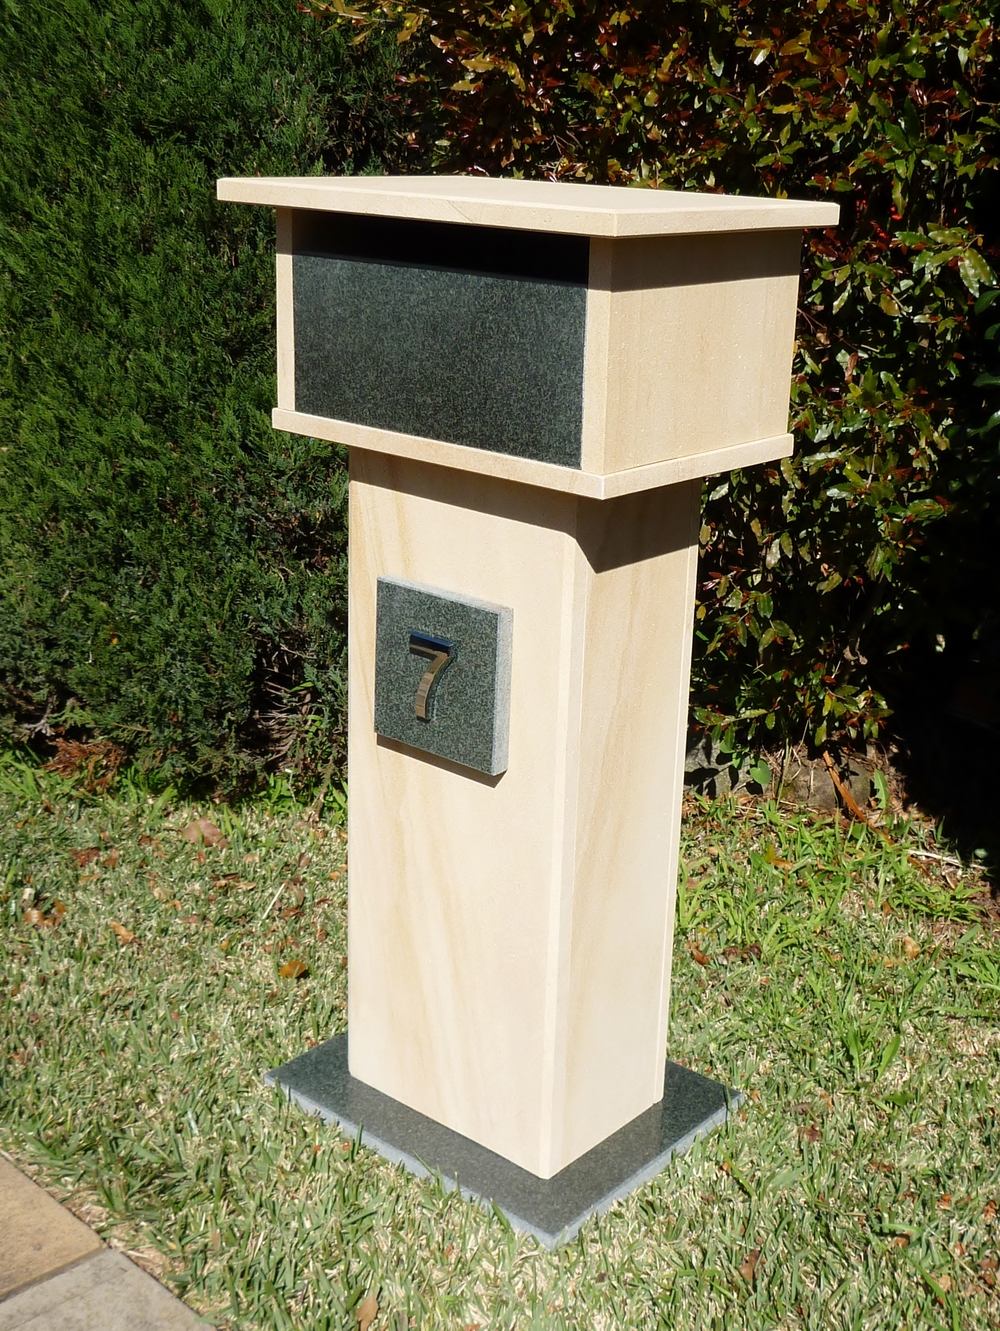 109. Sandstone with granite front, aluminium back door with 2 key lock lock 400x300x850 $440